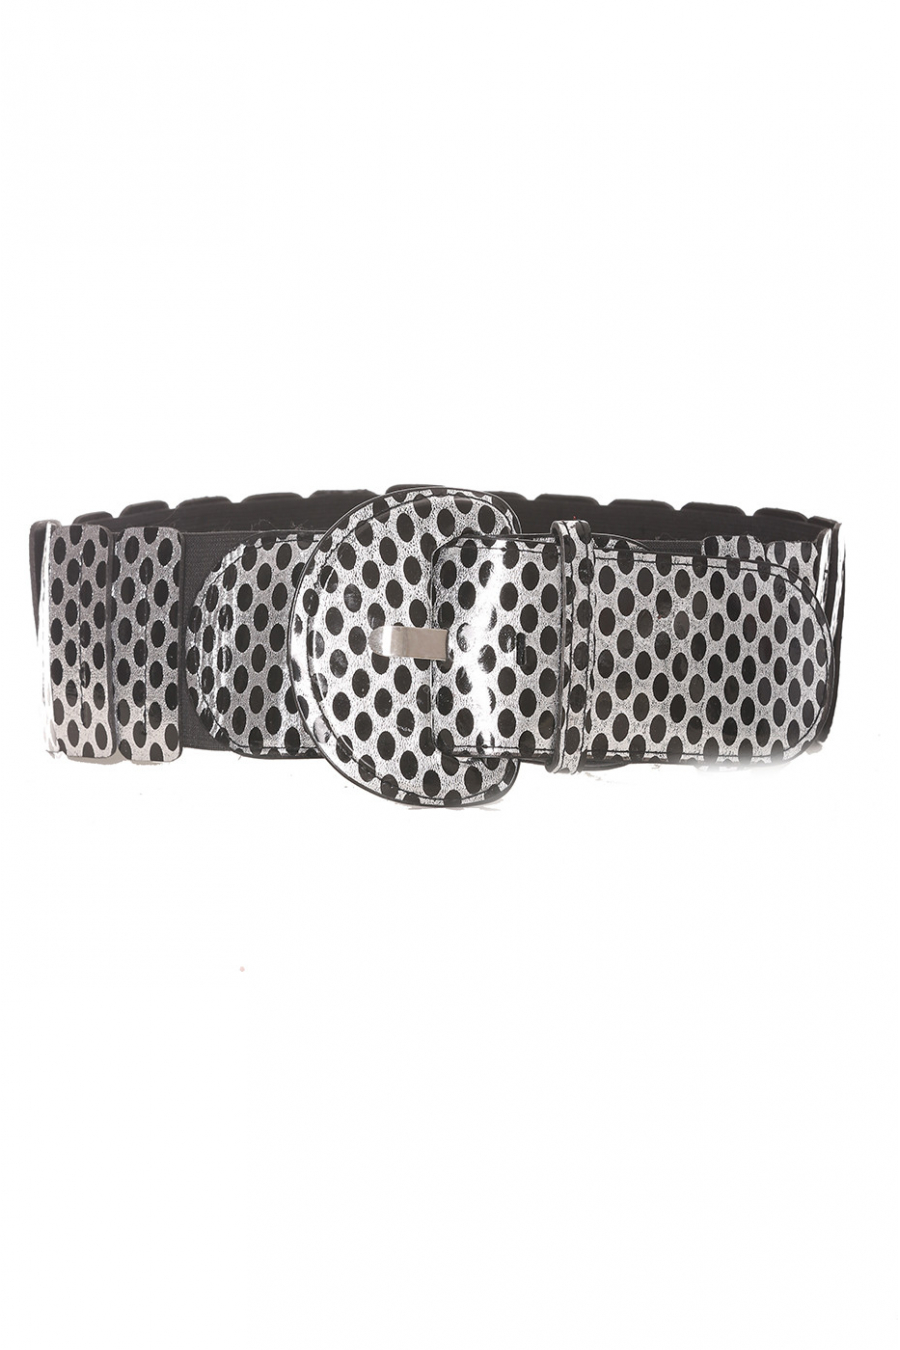 Black elastic waistband with print - BG - P045